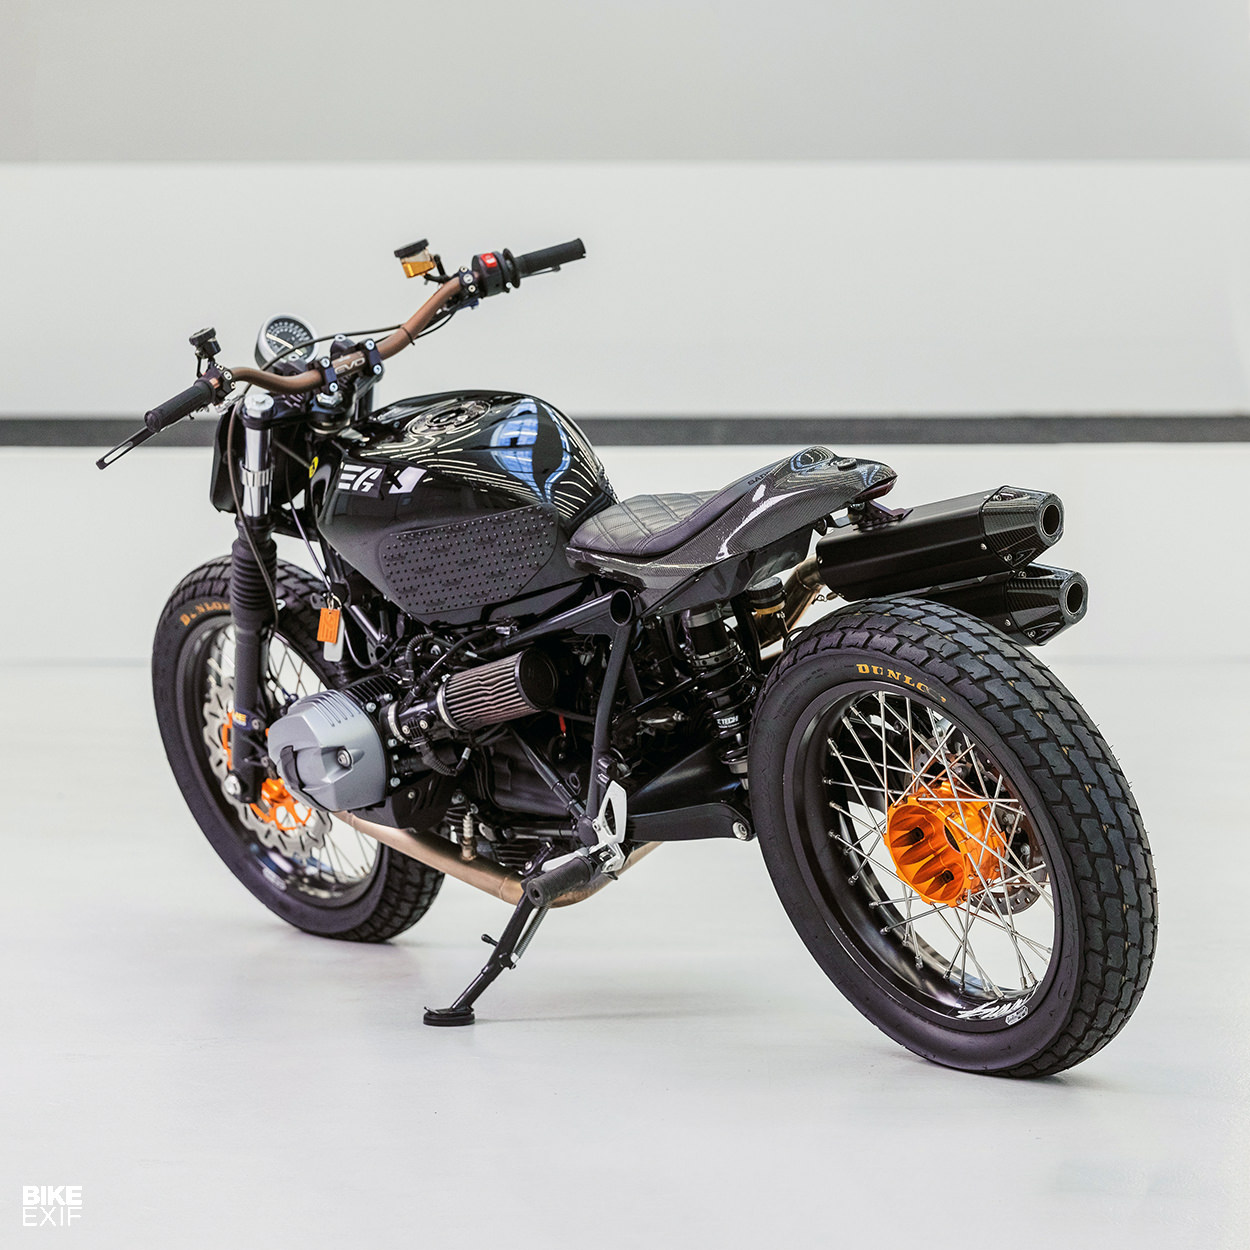 Maxx Headroom Gunn Design S Bmw Flat Tracker Bike Exif